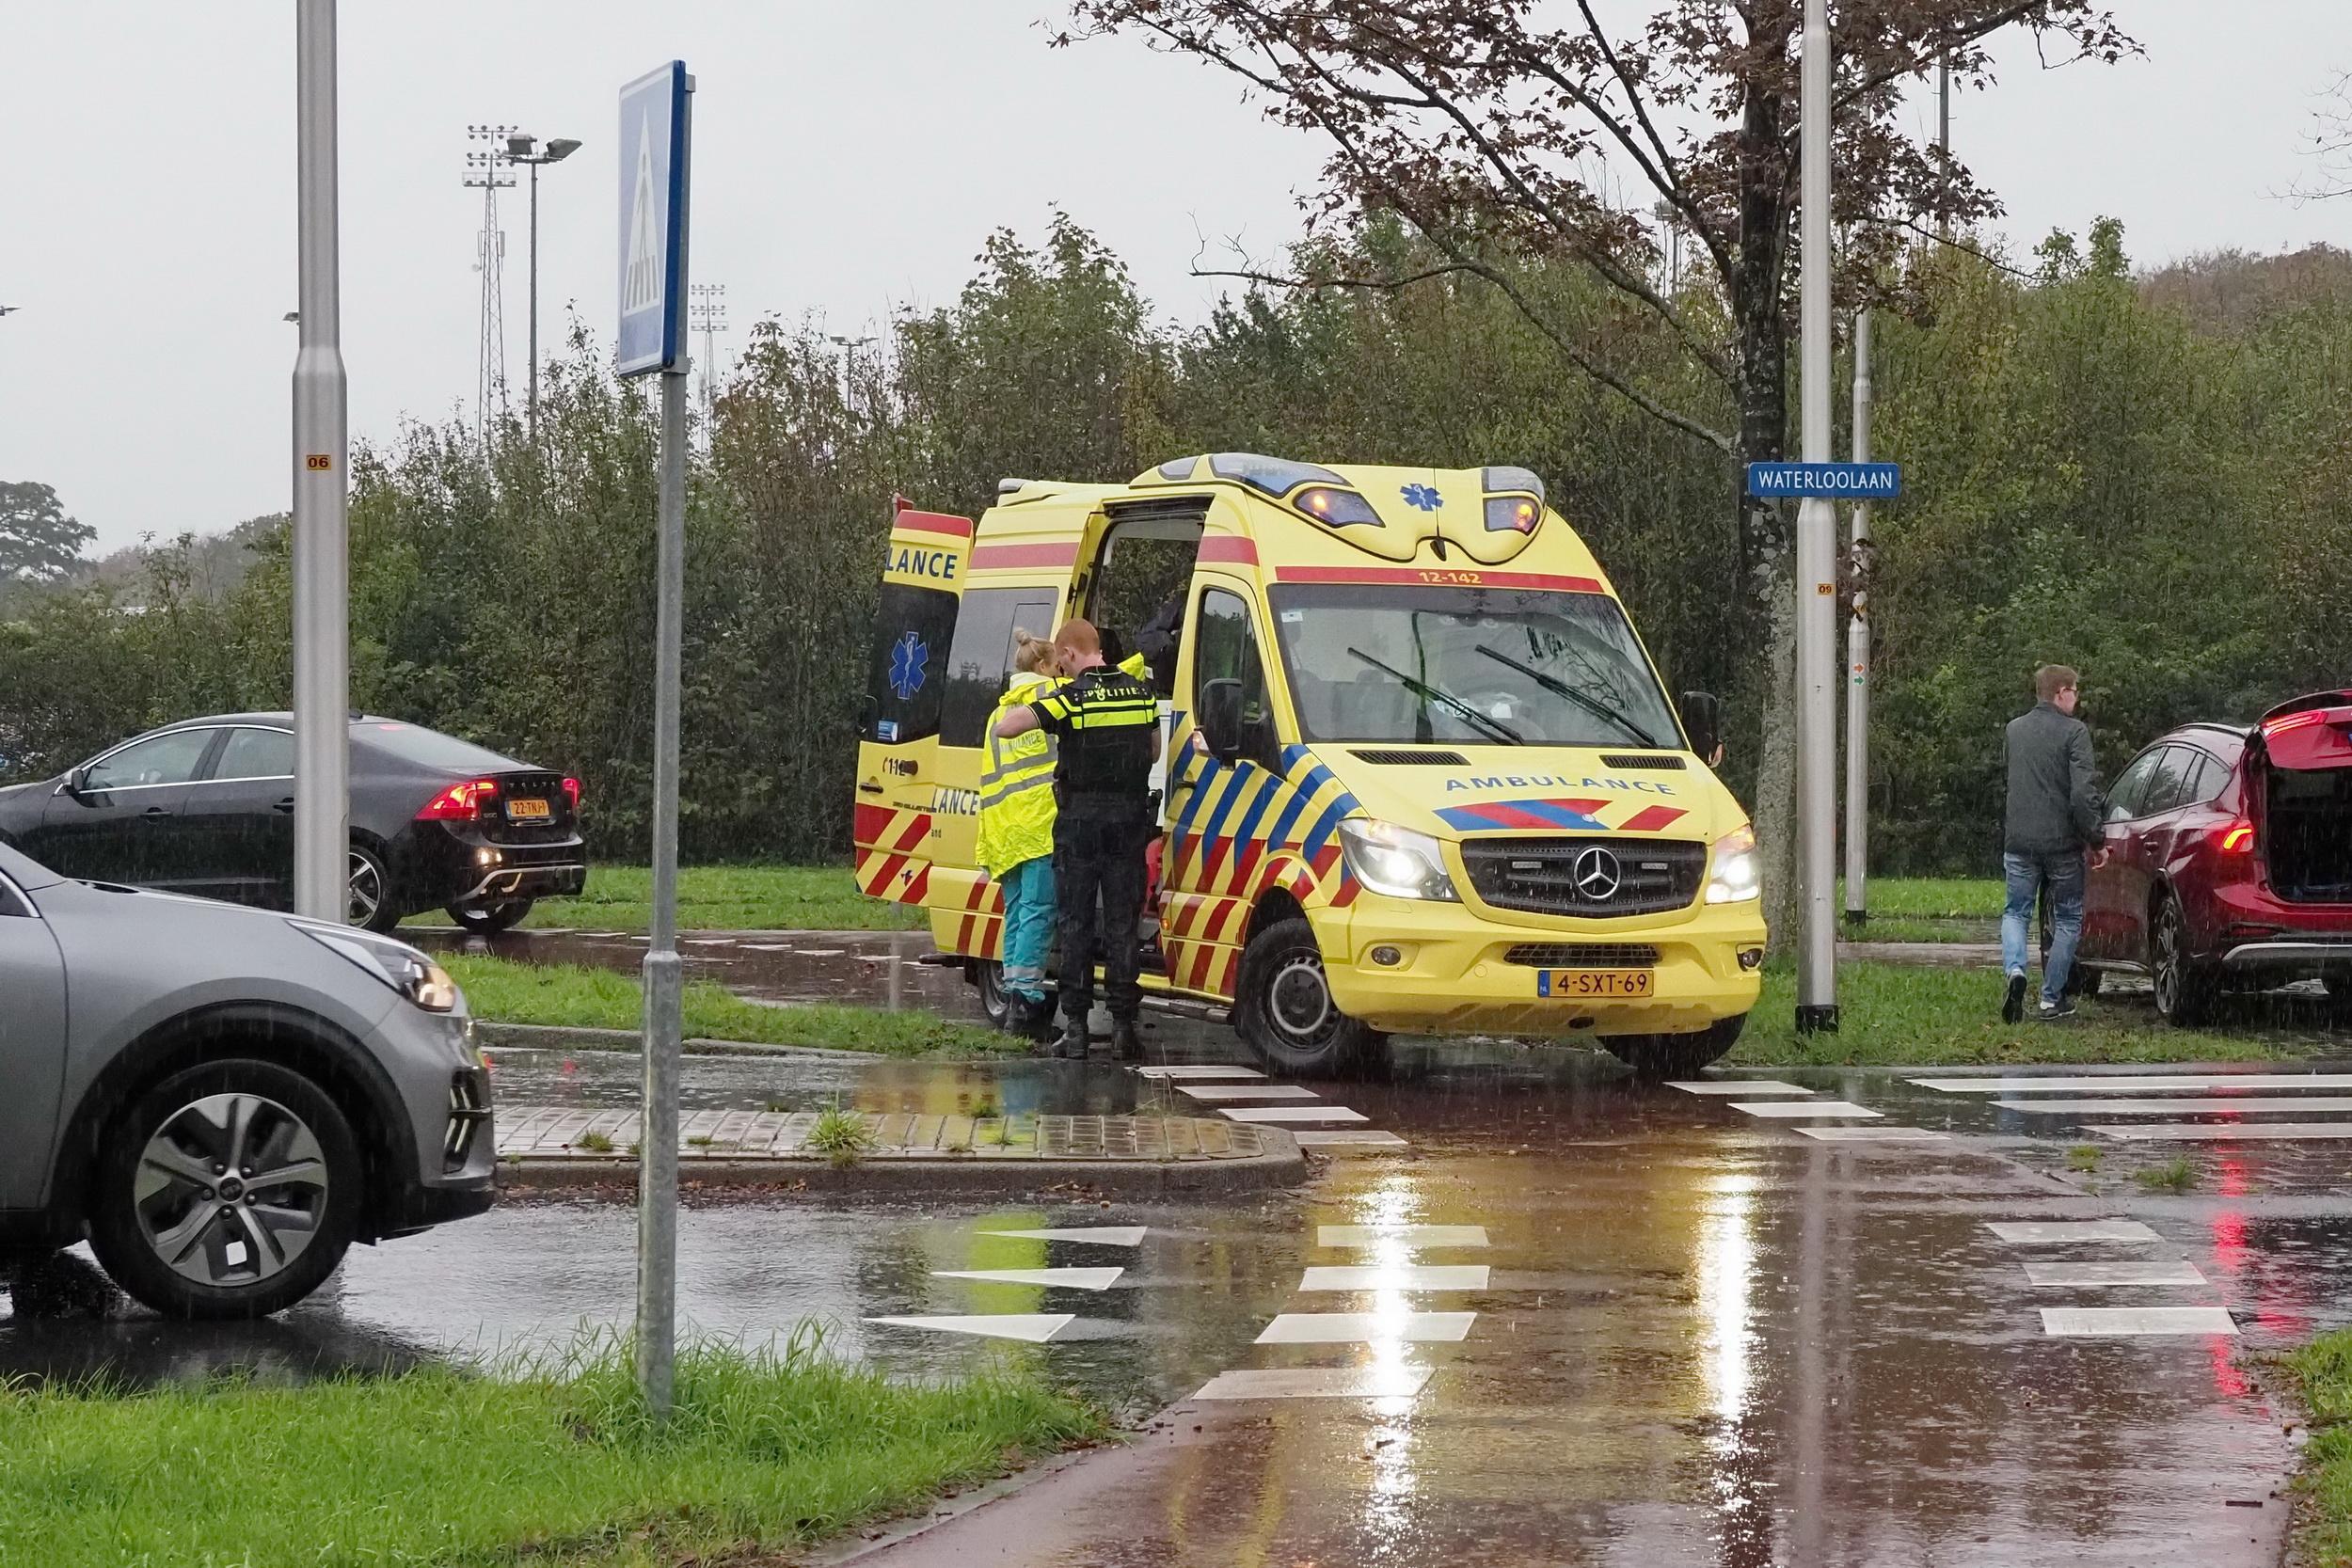 Fietser gewond bij valpartij in Driehuis